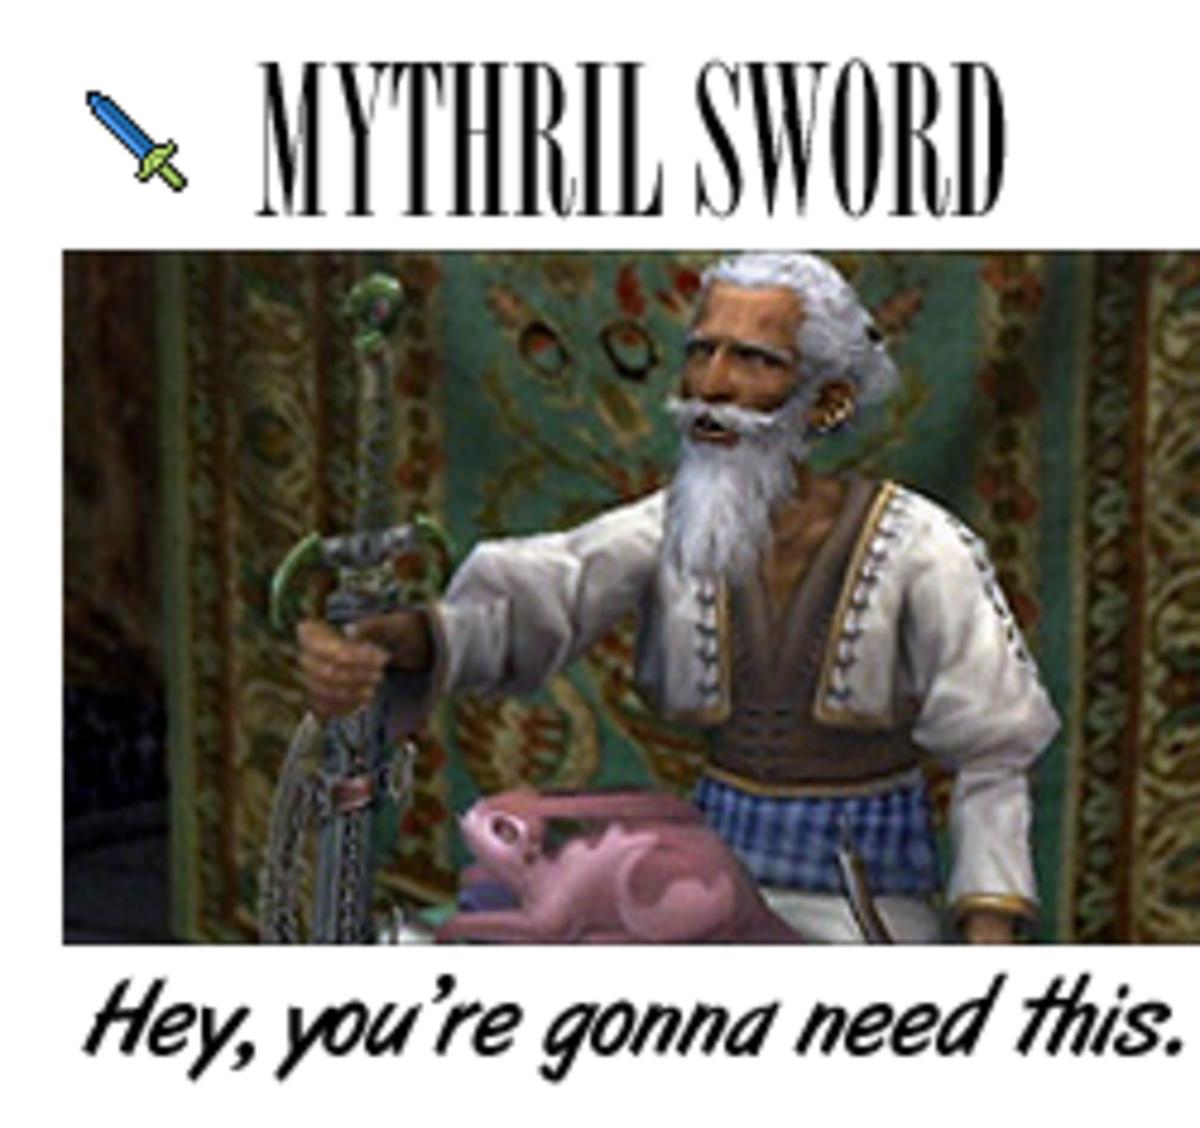 Mythril Swords